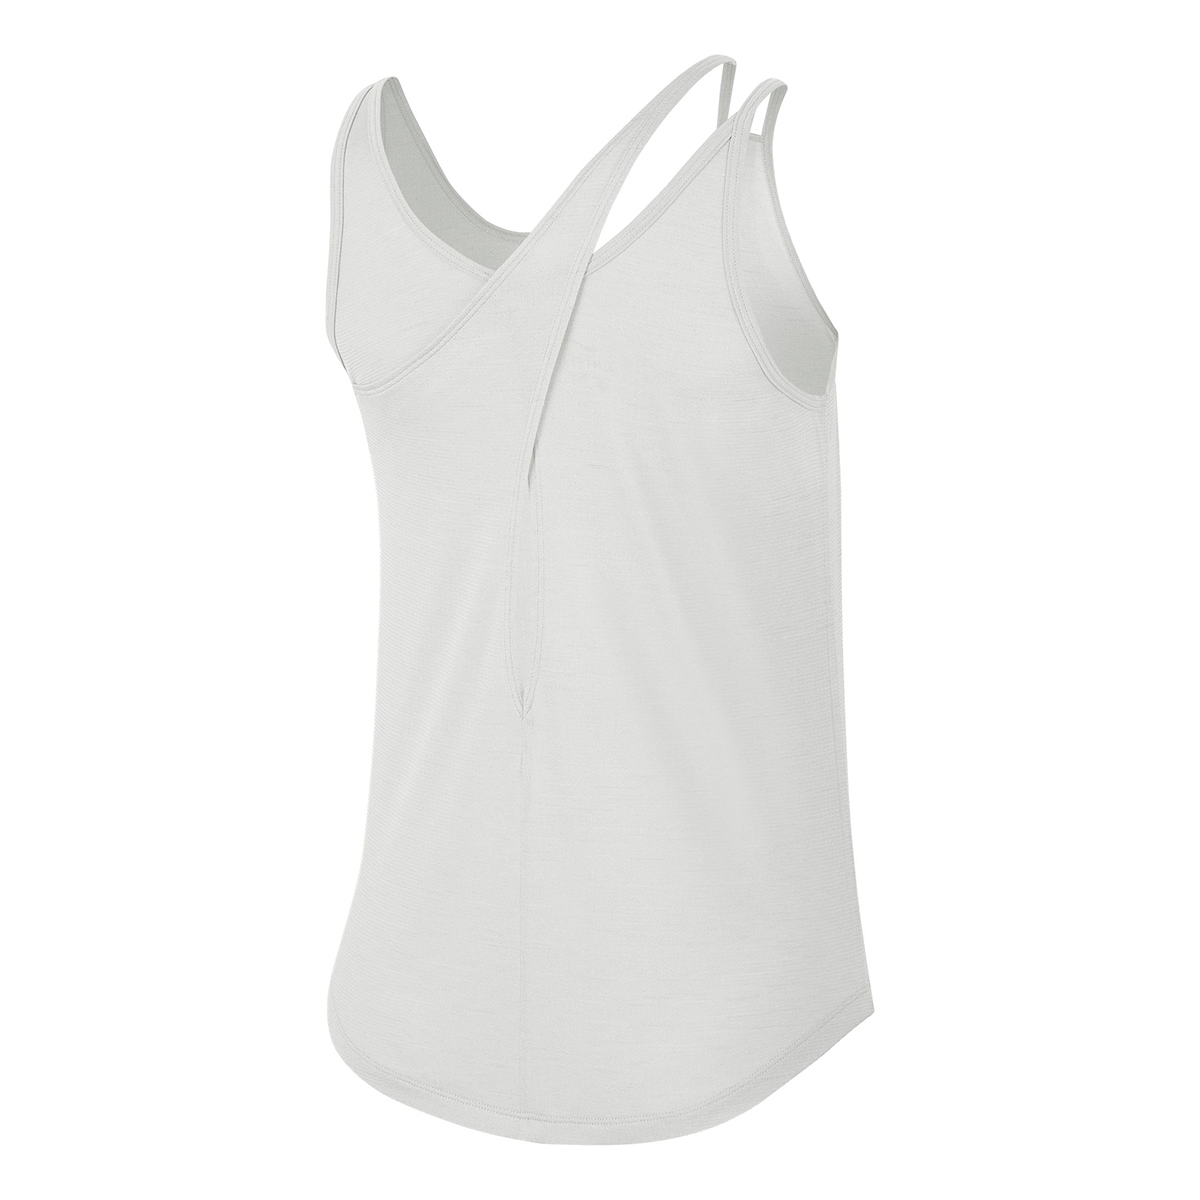 Women's Nike Runway Tank - Color: Platinum - Size: XS, Platinum, large, image 2